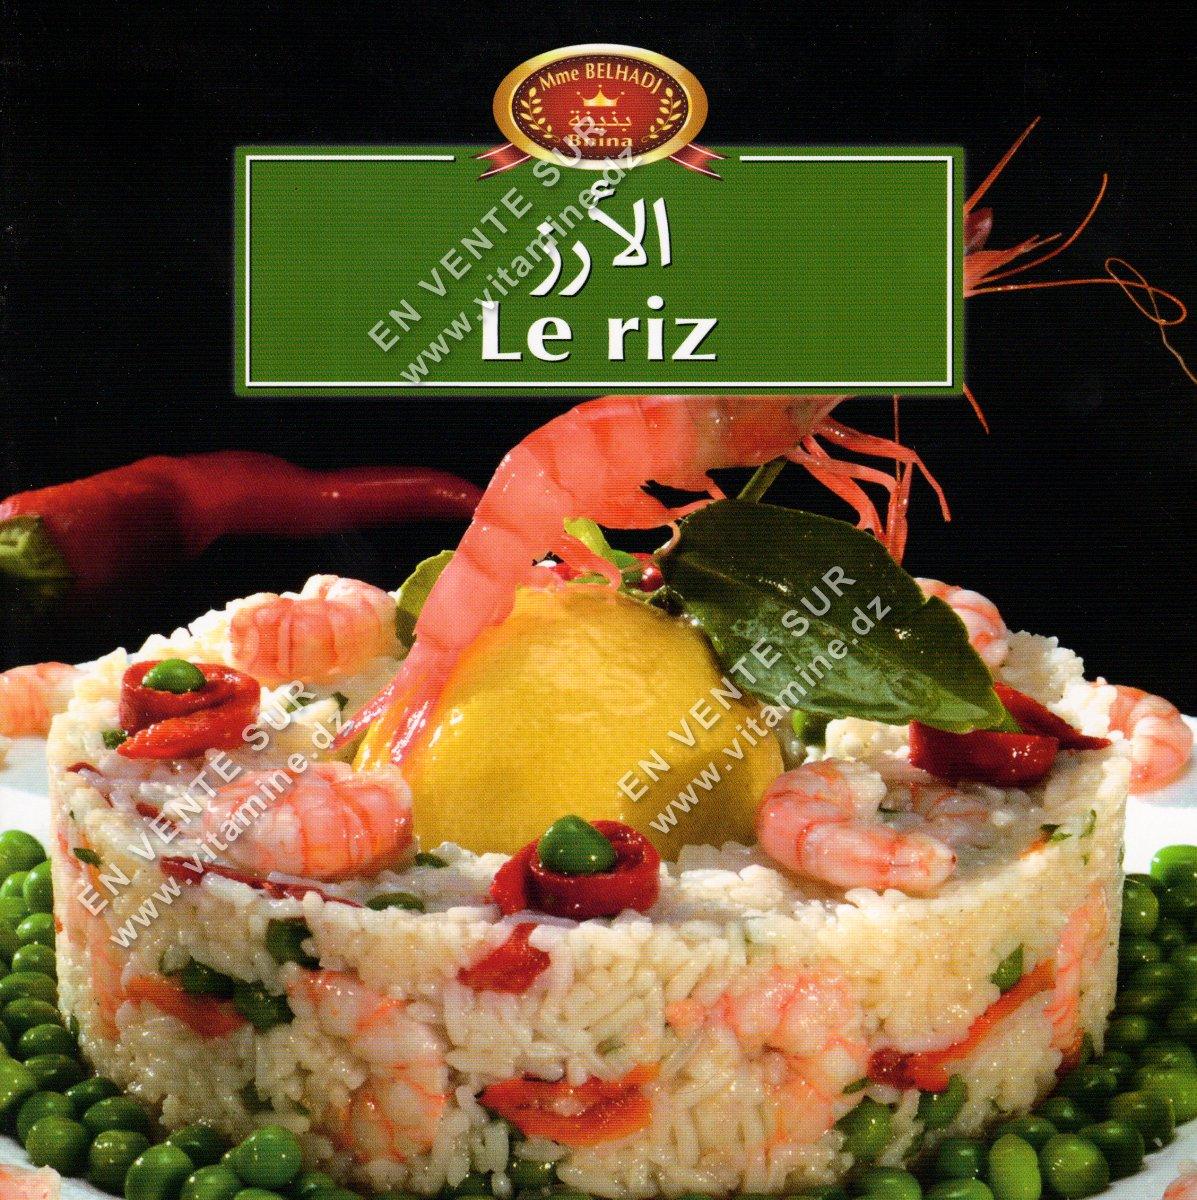 Bnina - Le riz